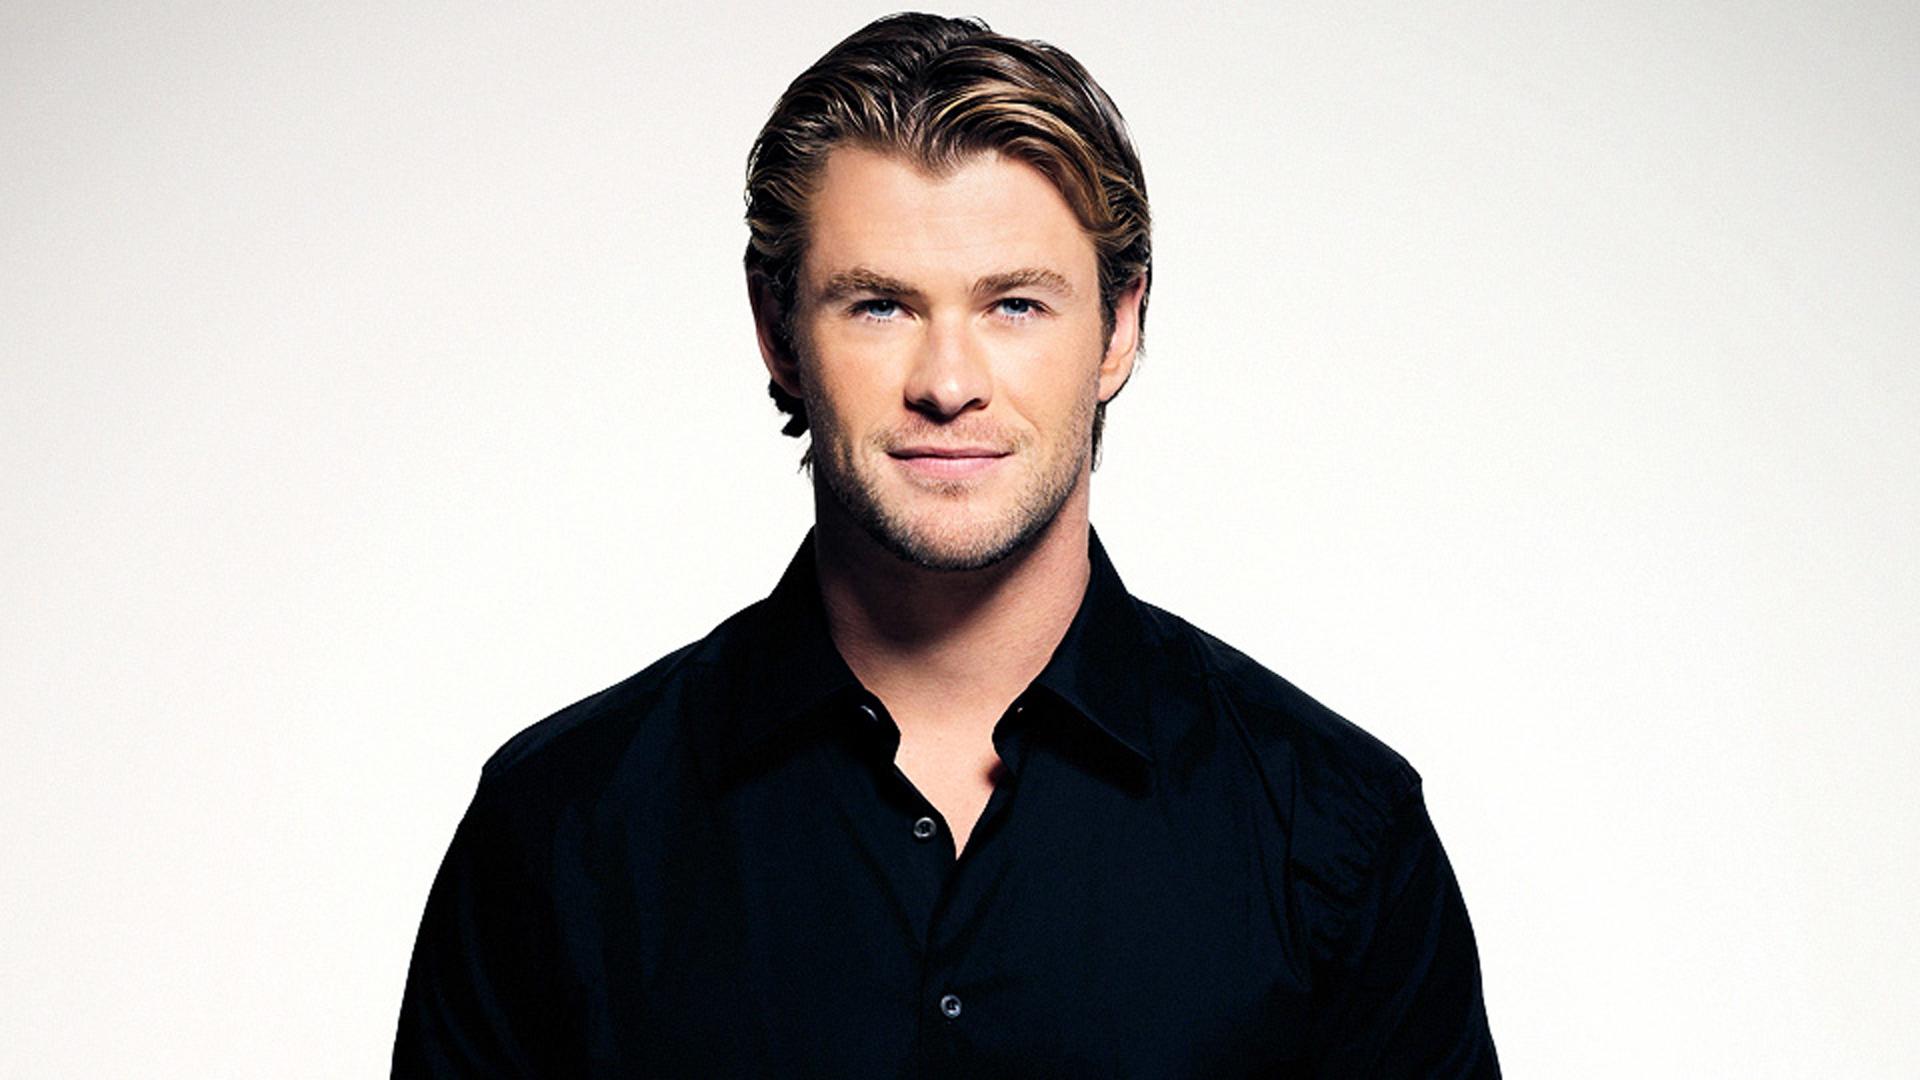 Chris Hemsworth High Quality Wallpapers